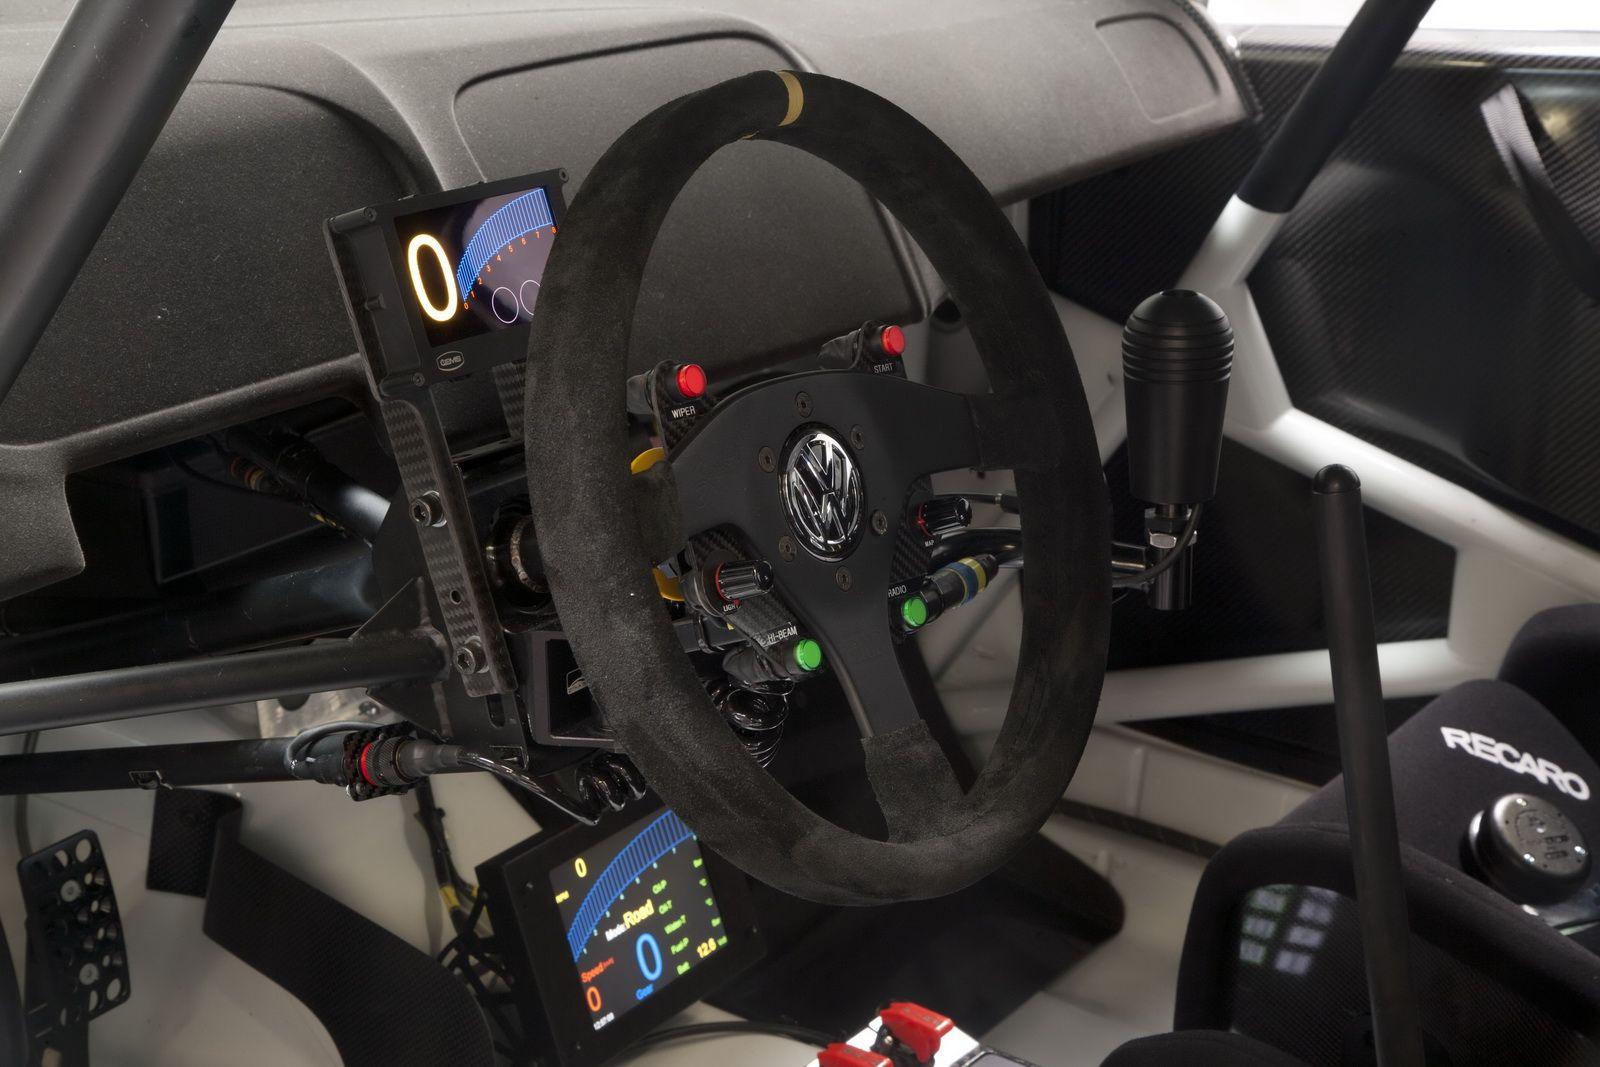 vw Polo R WRC cockpit | stuff I want | Pinterest | Polos | {Auto cockpit vw 83}